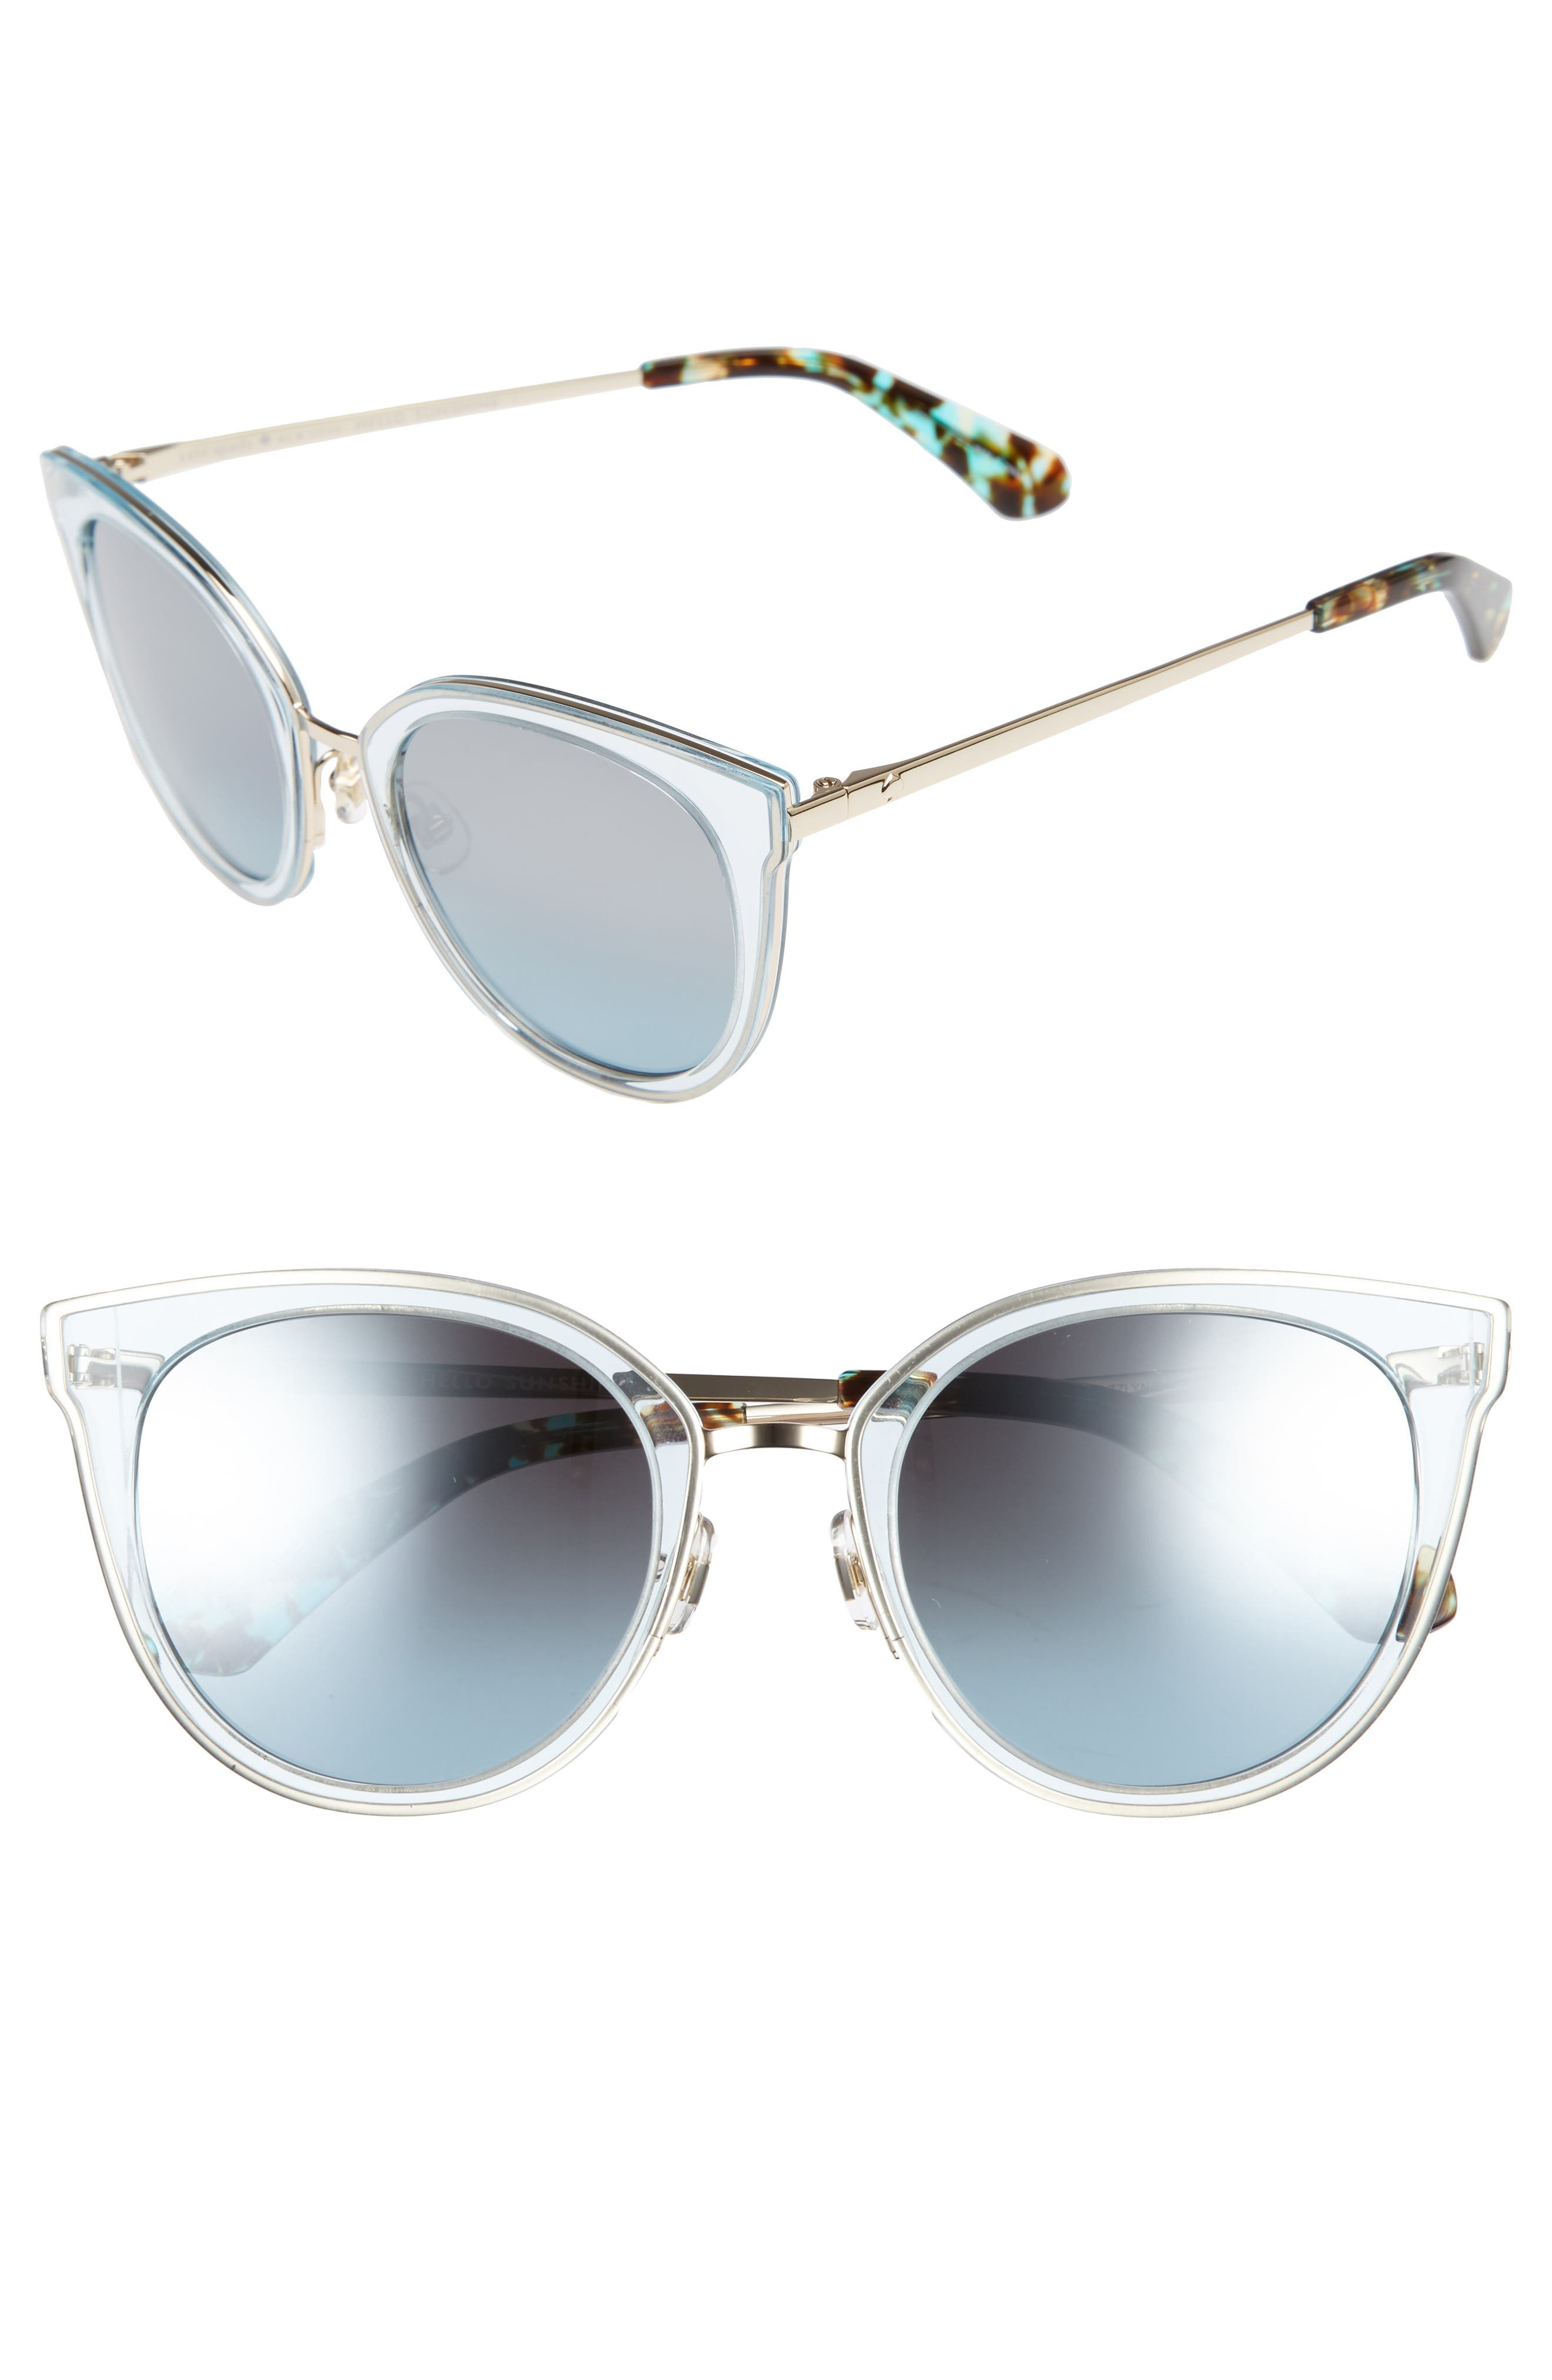 Alternate Image 1 Selected - kate spade new york jazzlyn 51mm Cat Eye Sunglasses